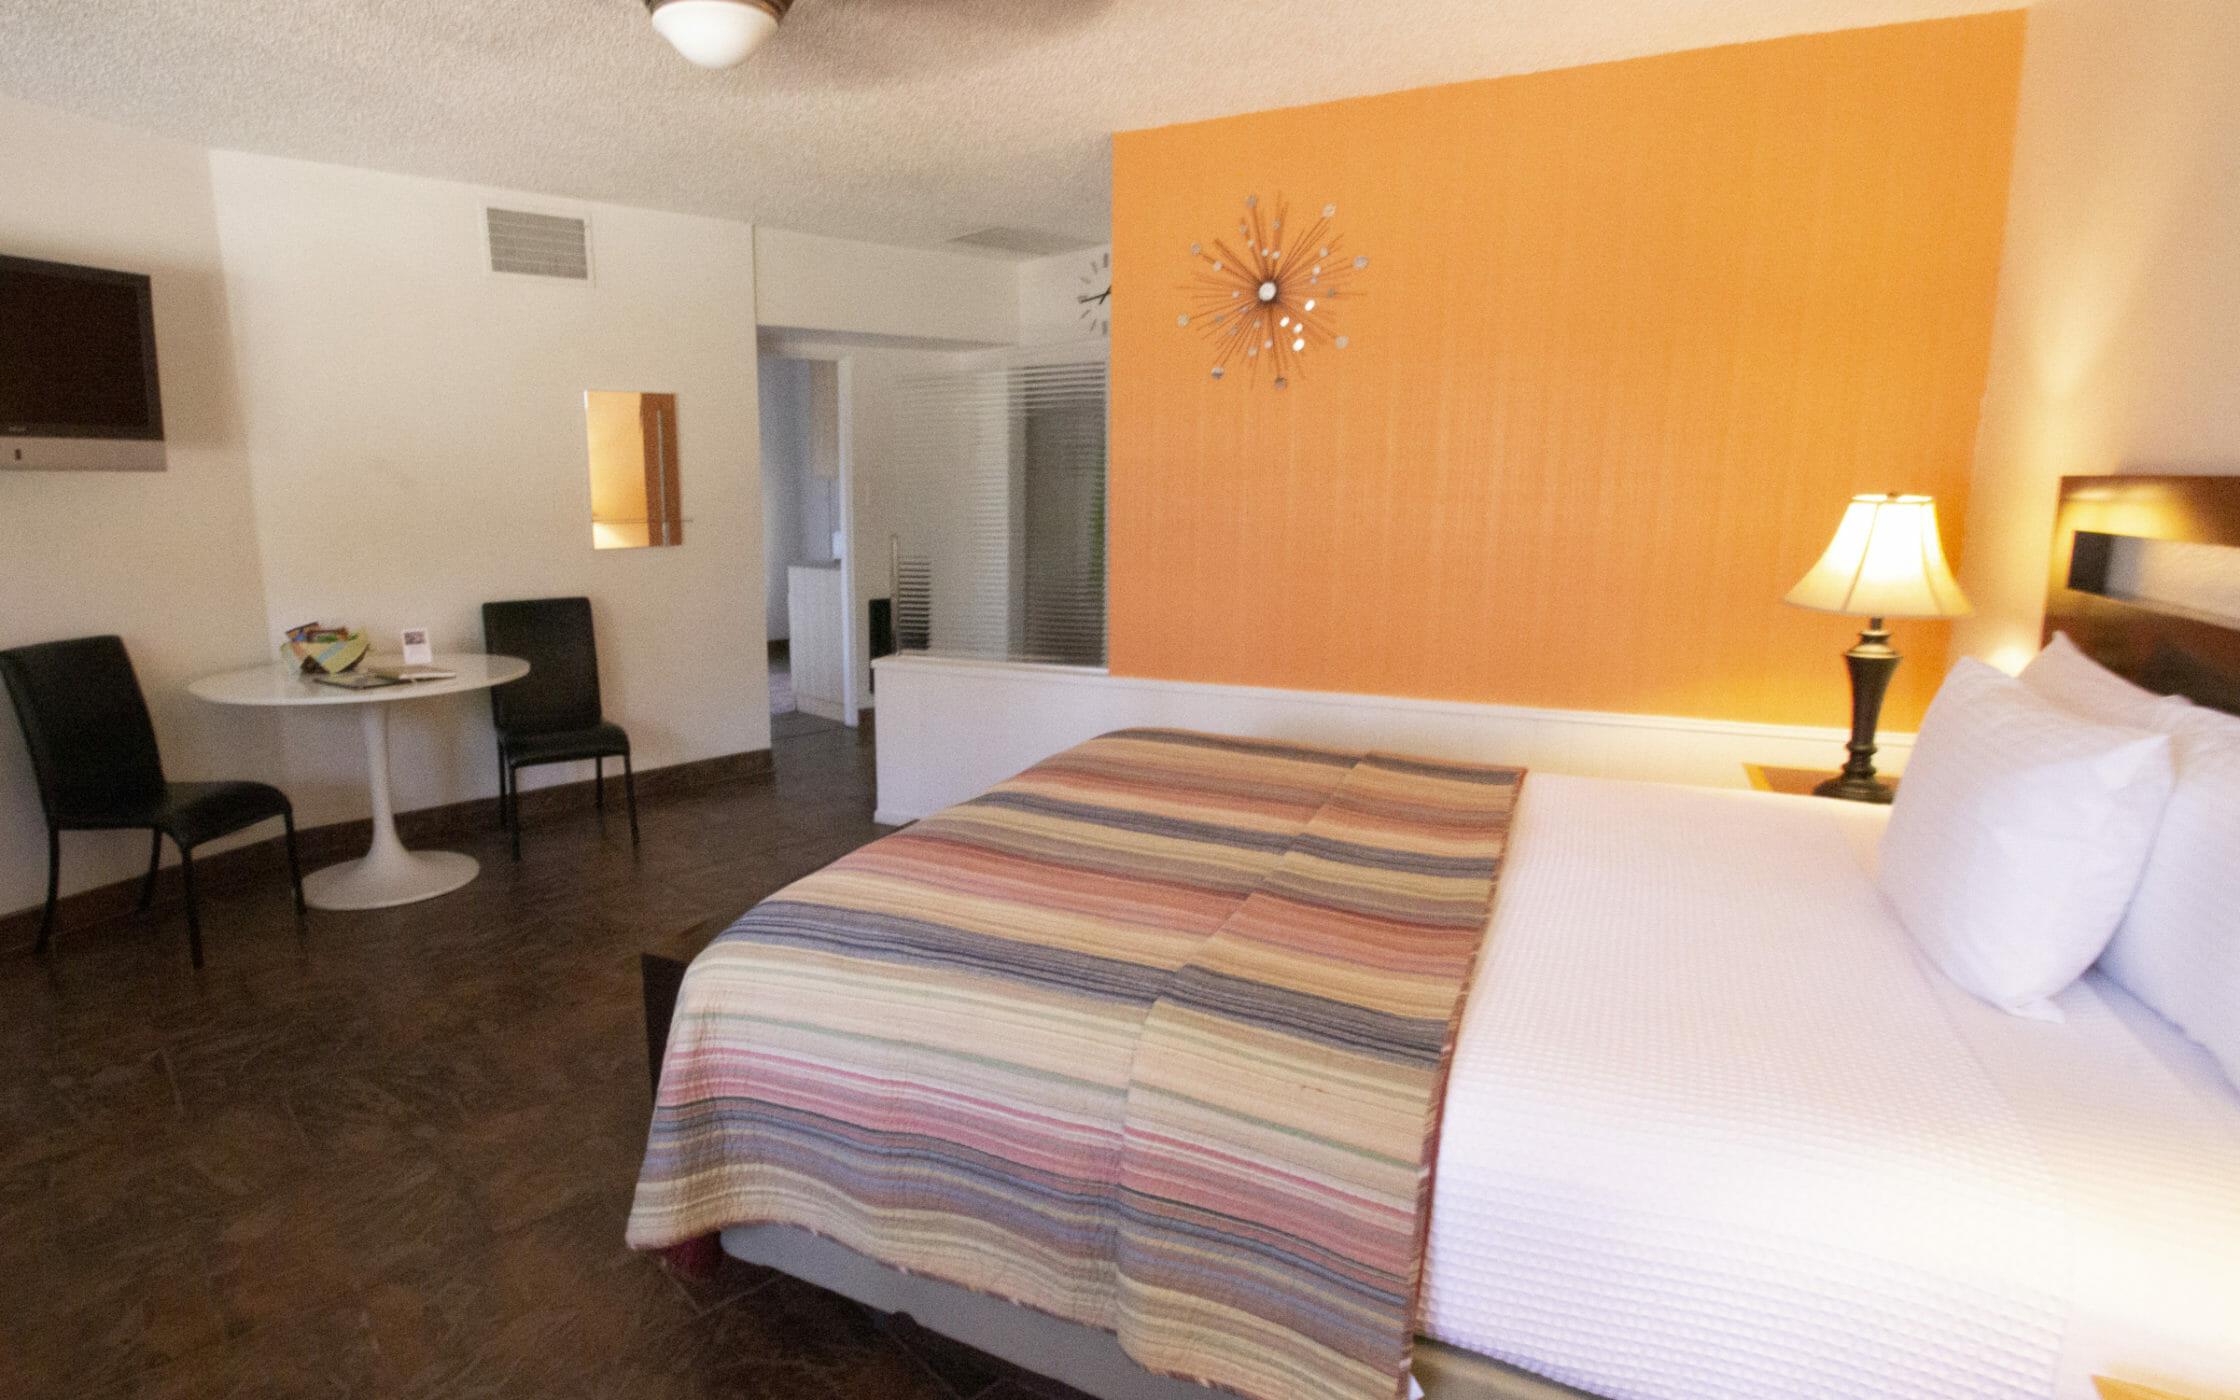 Room at the Desert Riviera Hotel